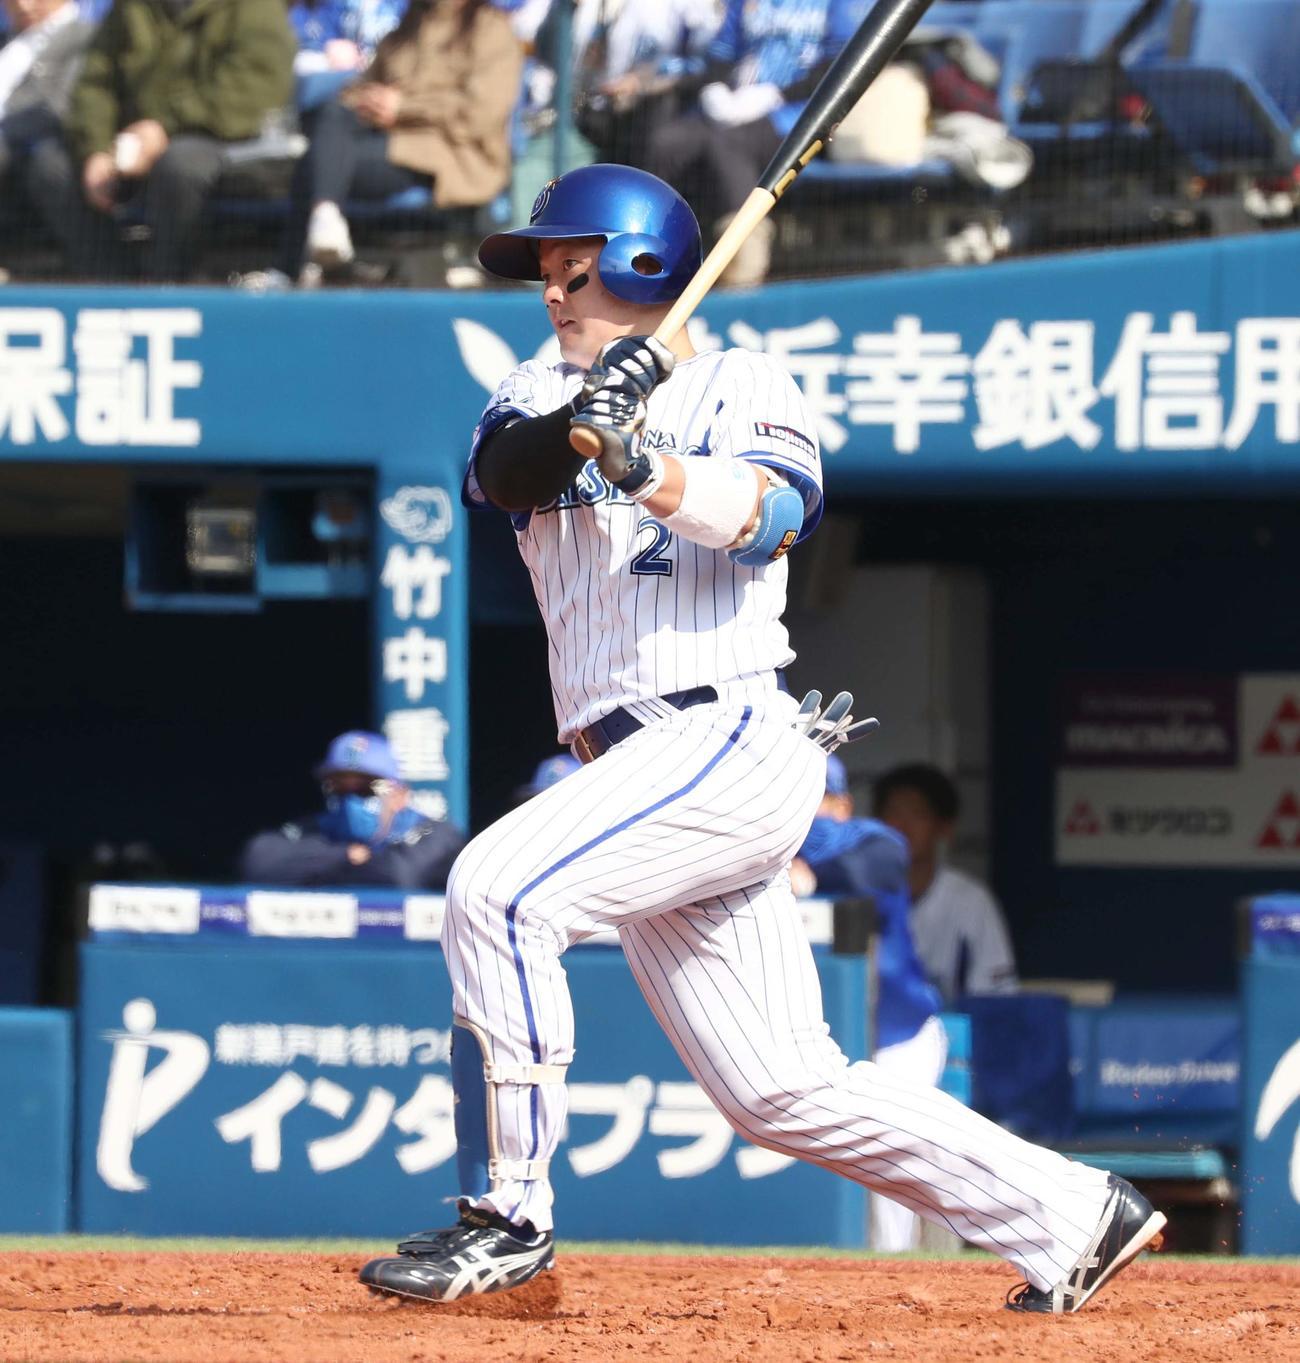 DeNA対日本ハム 2回裏DeNA1死二、三塁、左越え2点適時二塁打を放つ牧(撮影・黒川智章)